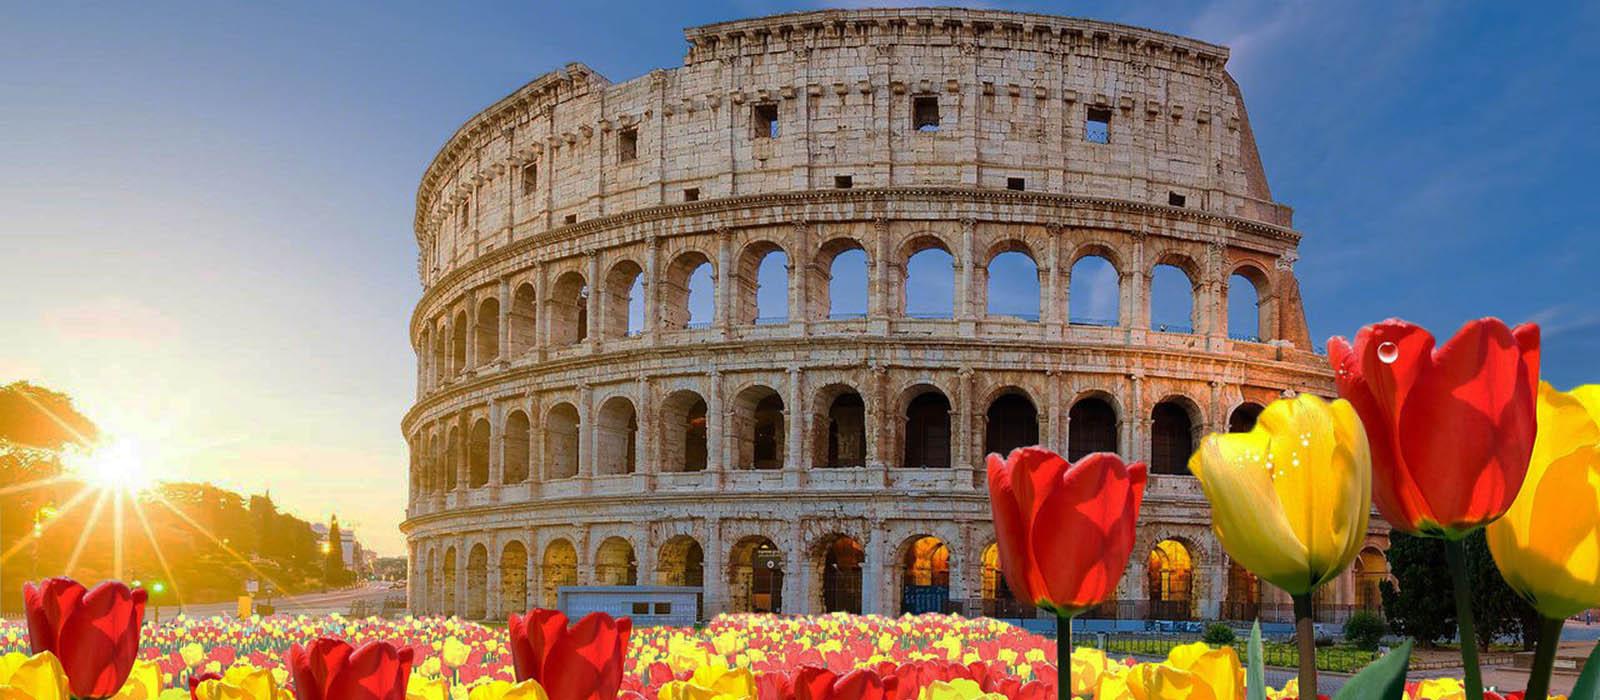 Permalink to: L'olanda a Roma